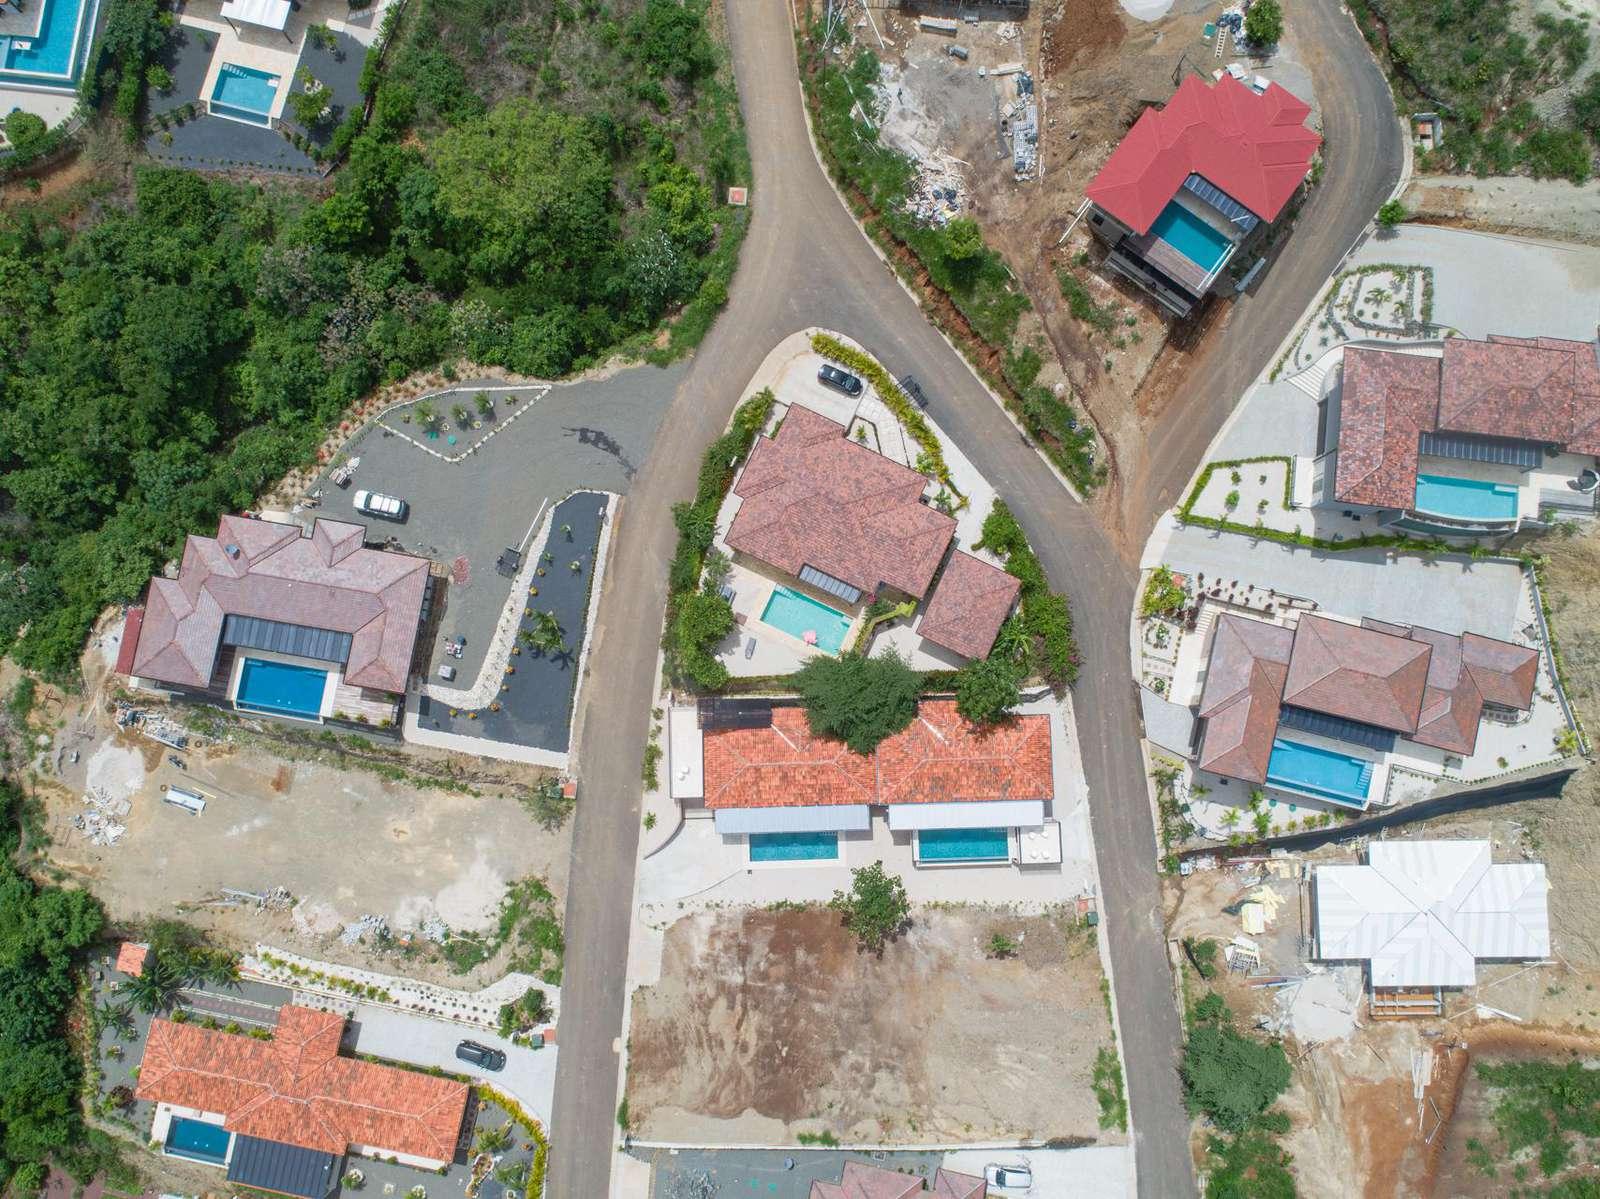 Dos Rios aerial view